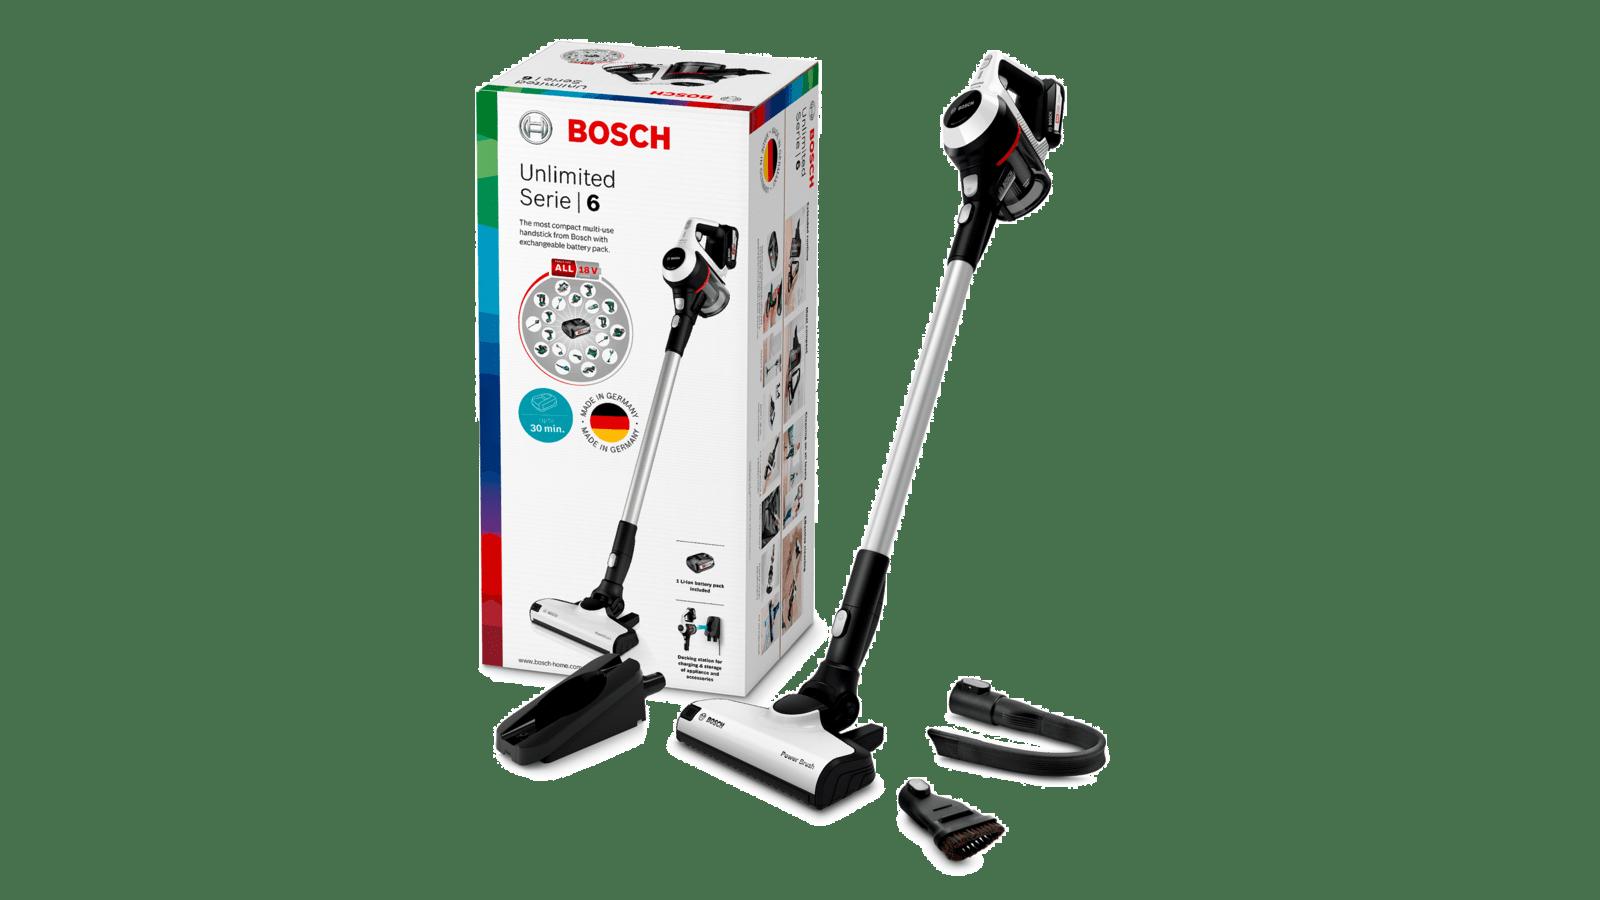 Bosch Unlimited Series 6 trådløs støvsuger BCS61113